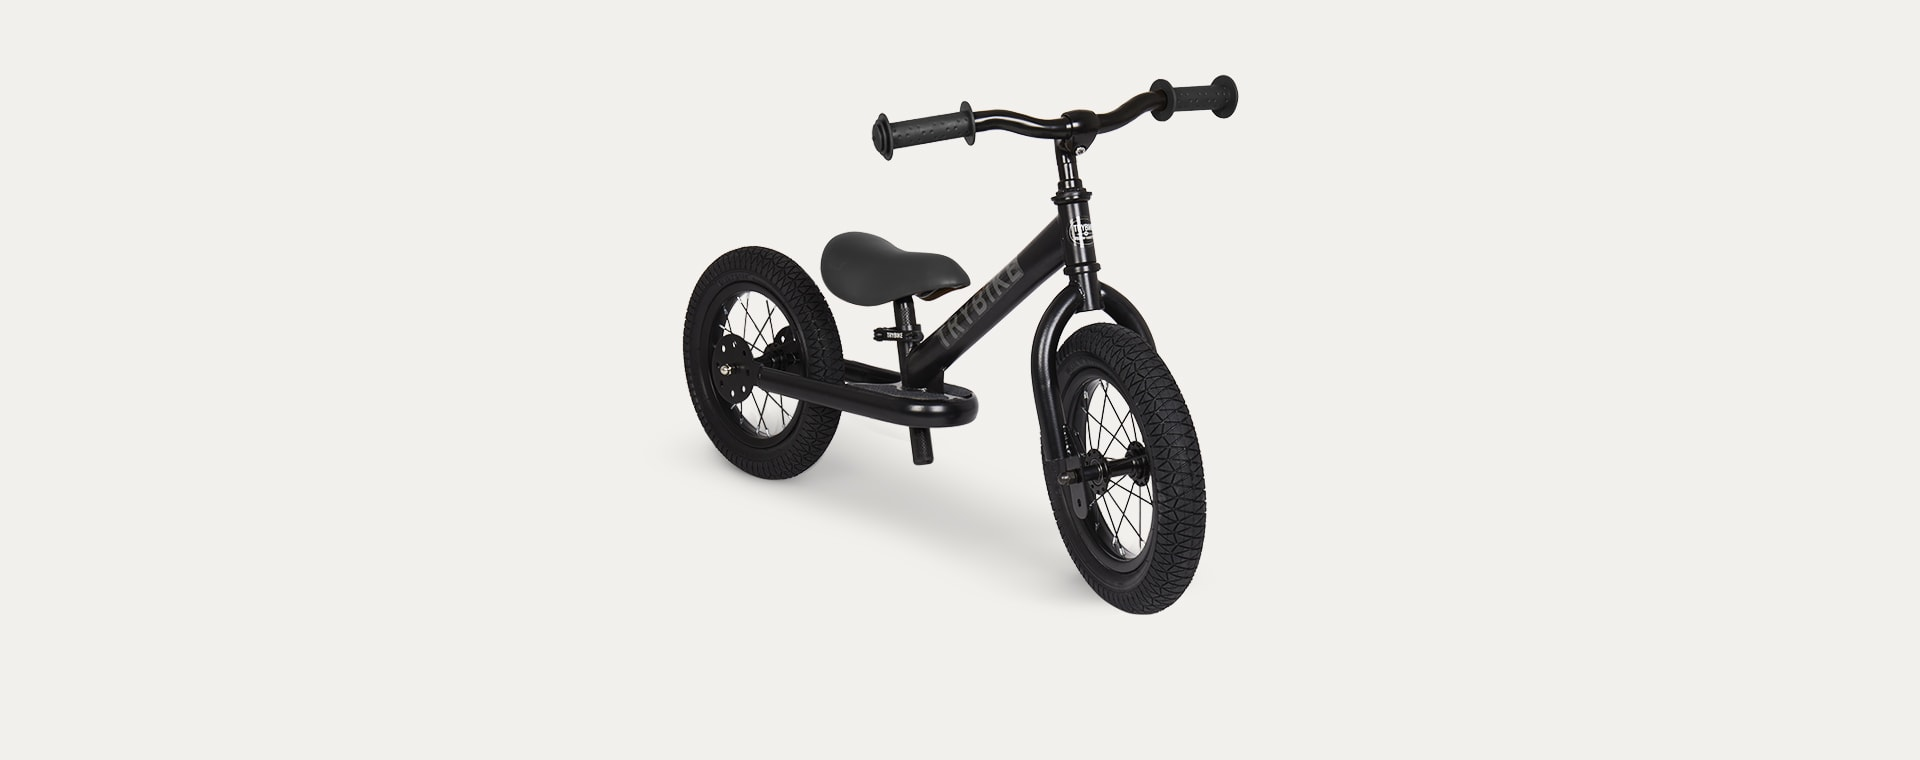 All Black TRYBIKE Steel 2-in-1 Trike